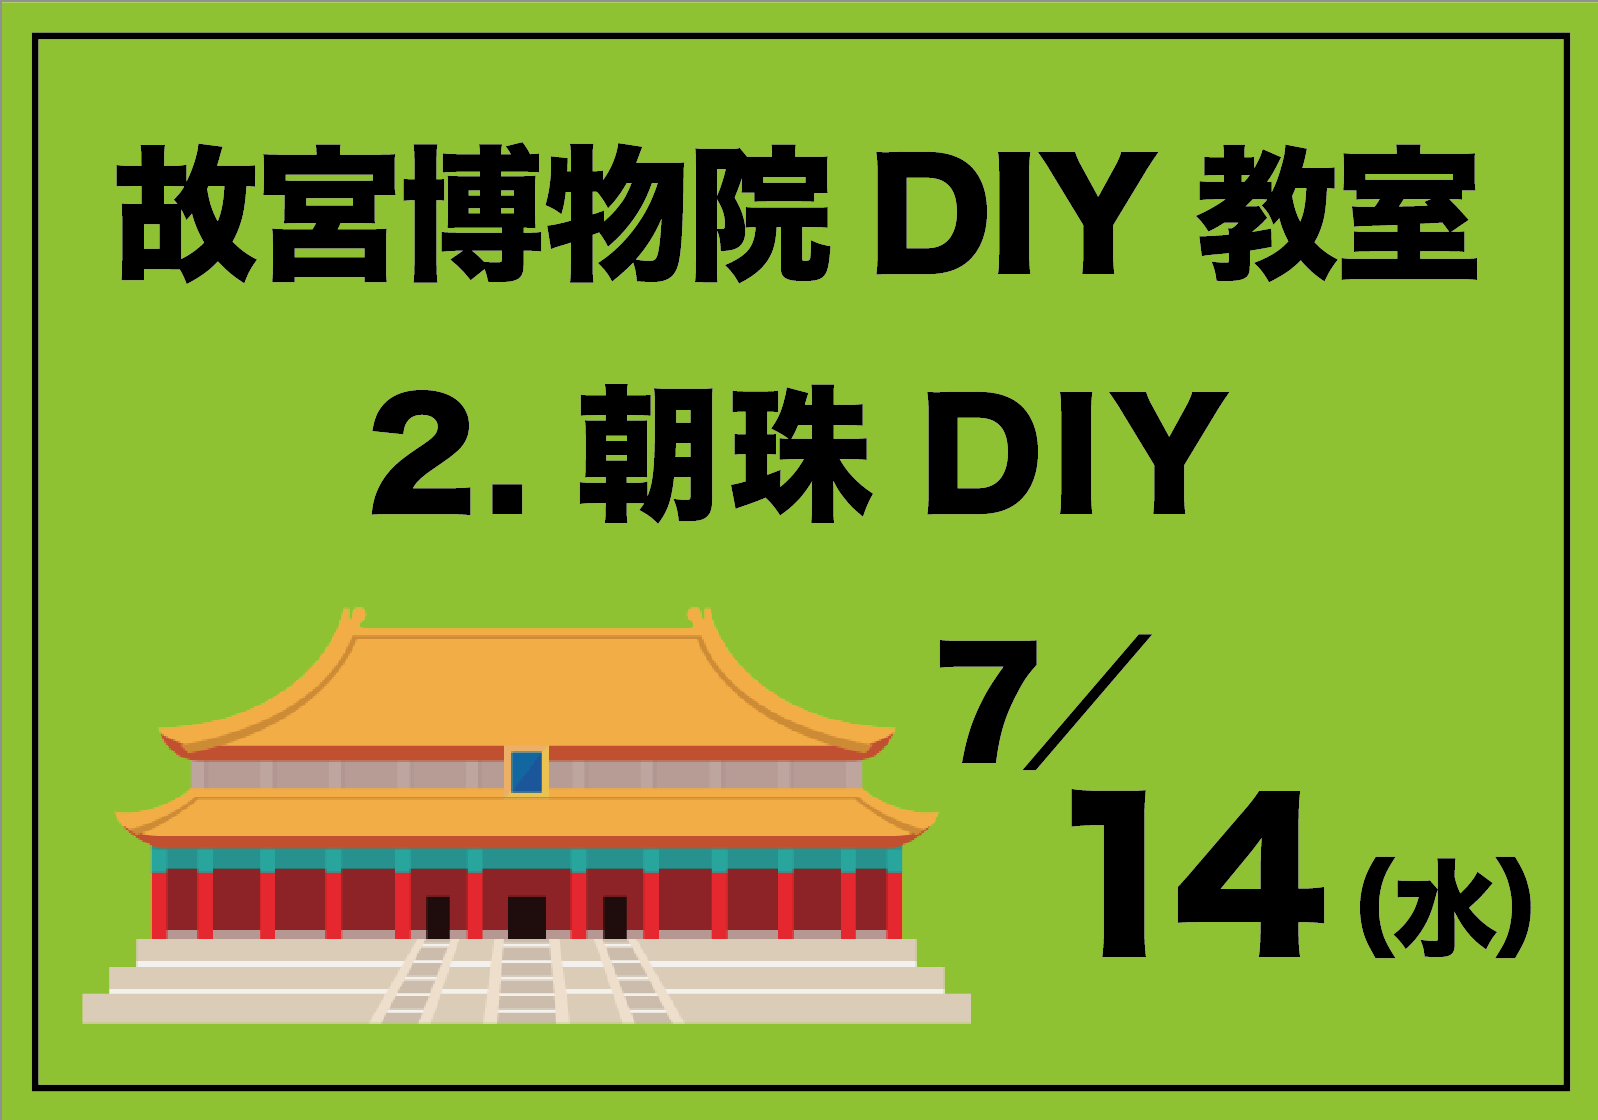 故宮博物院DIY教室「2.朝珠DIY」7月14日